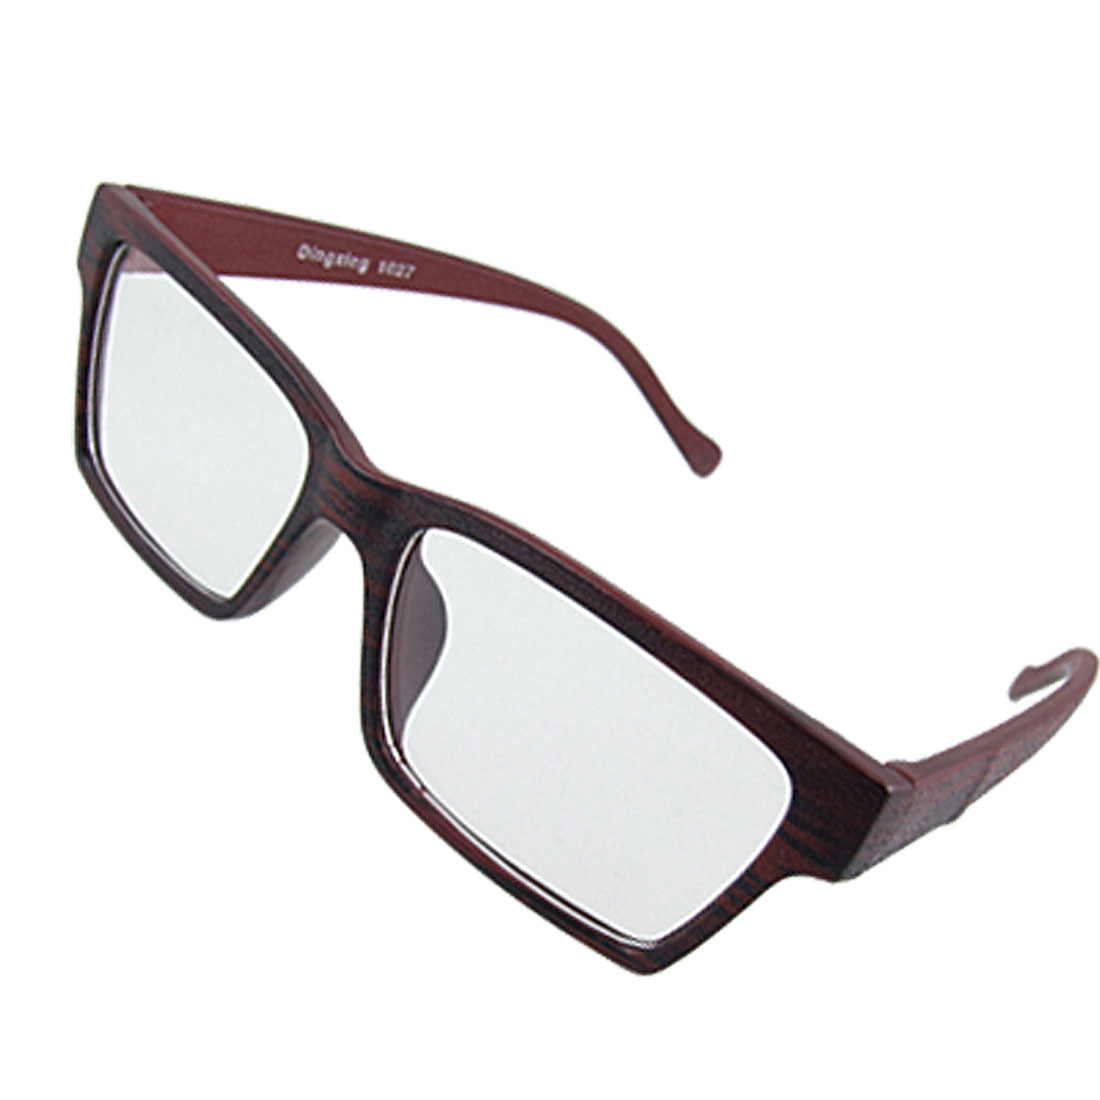 Deep Wine Plastic Full Rim Unisex Clear Lens Glasses